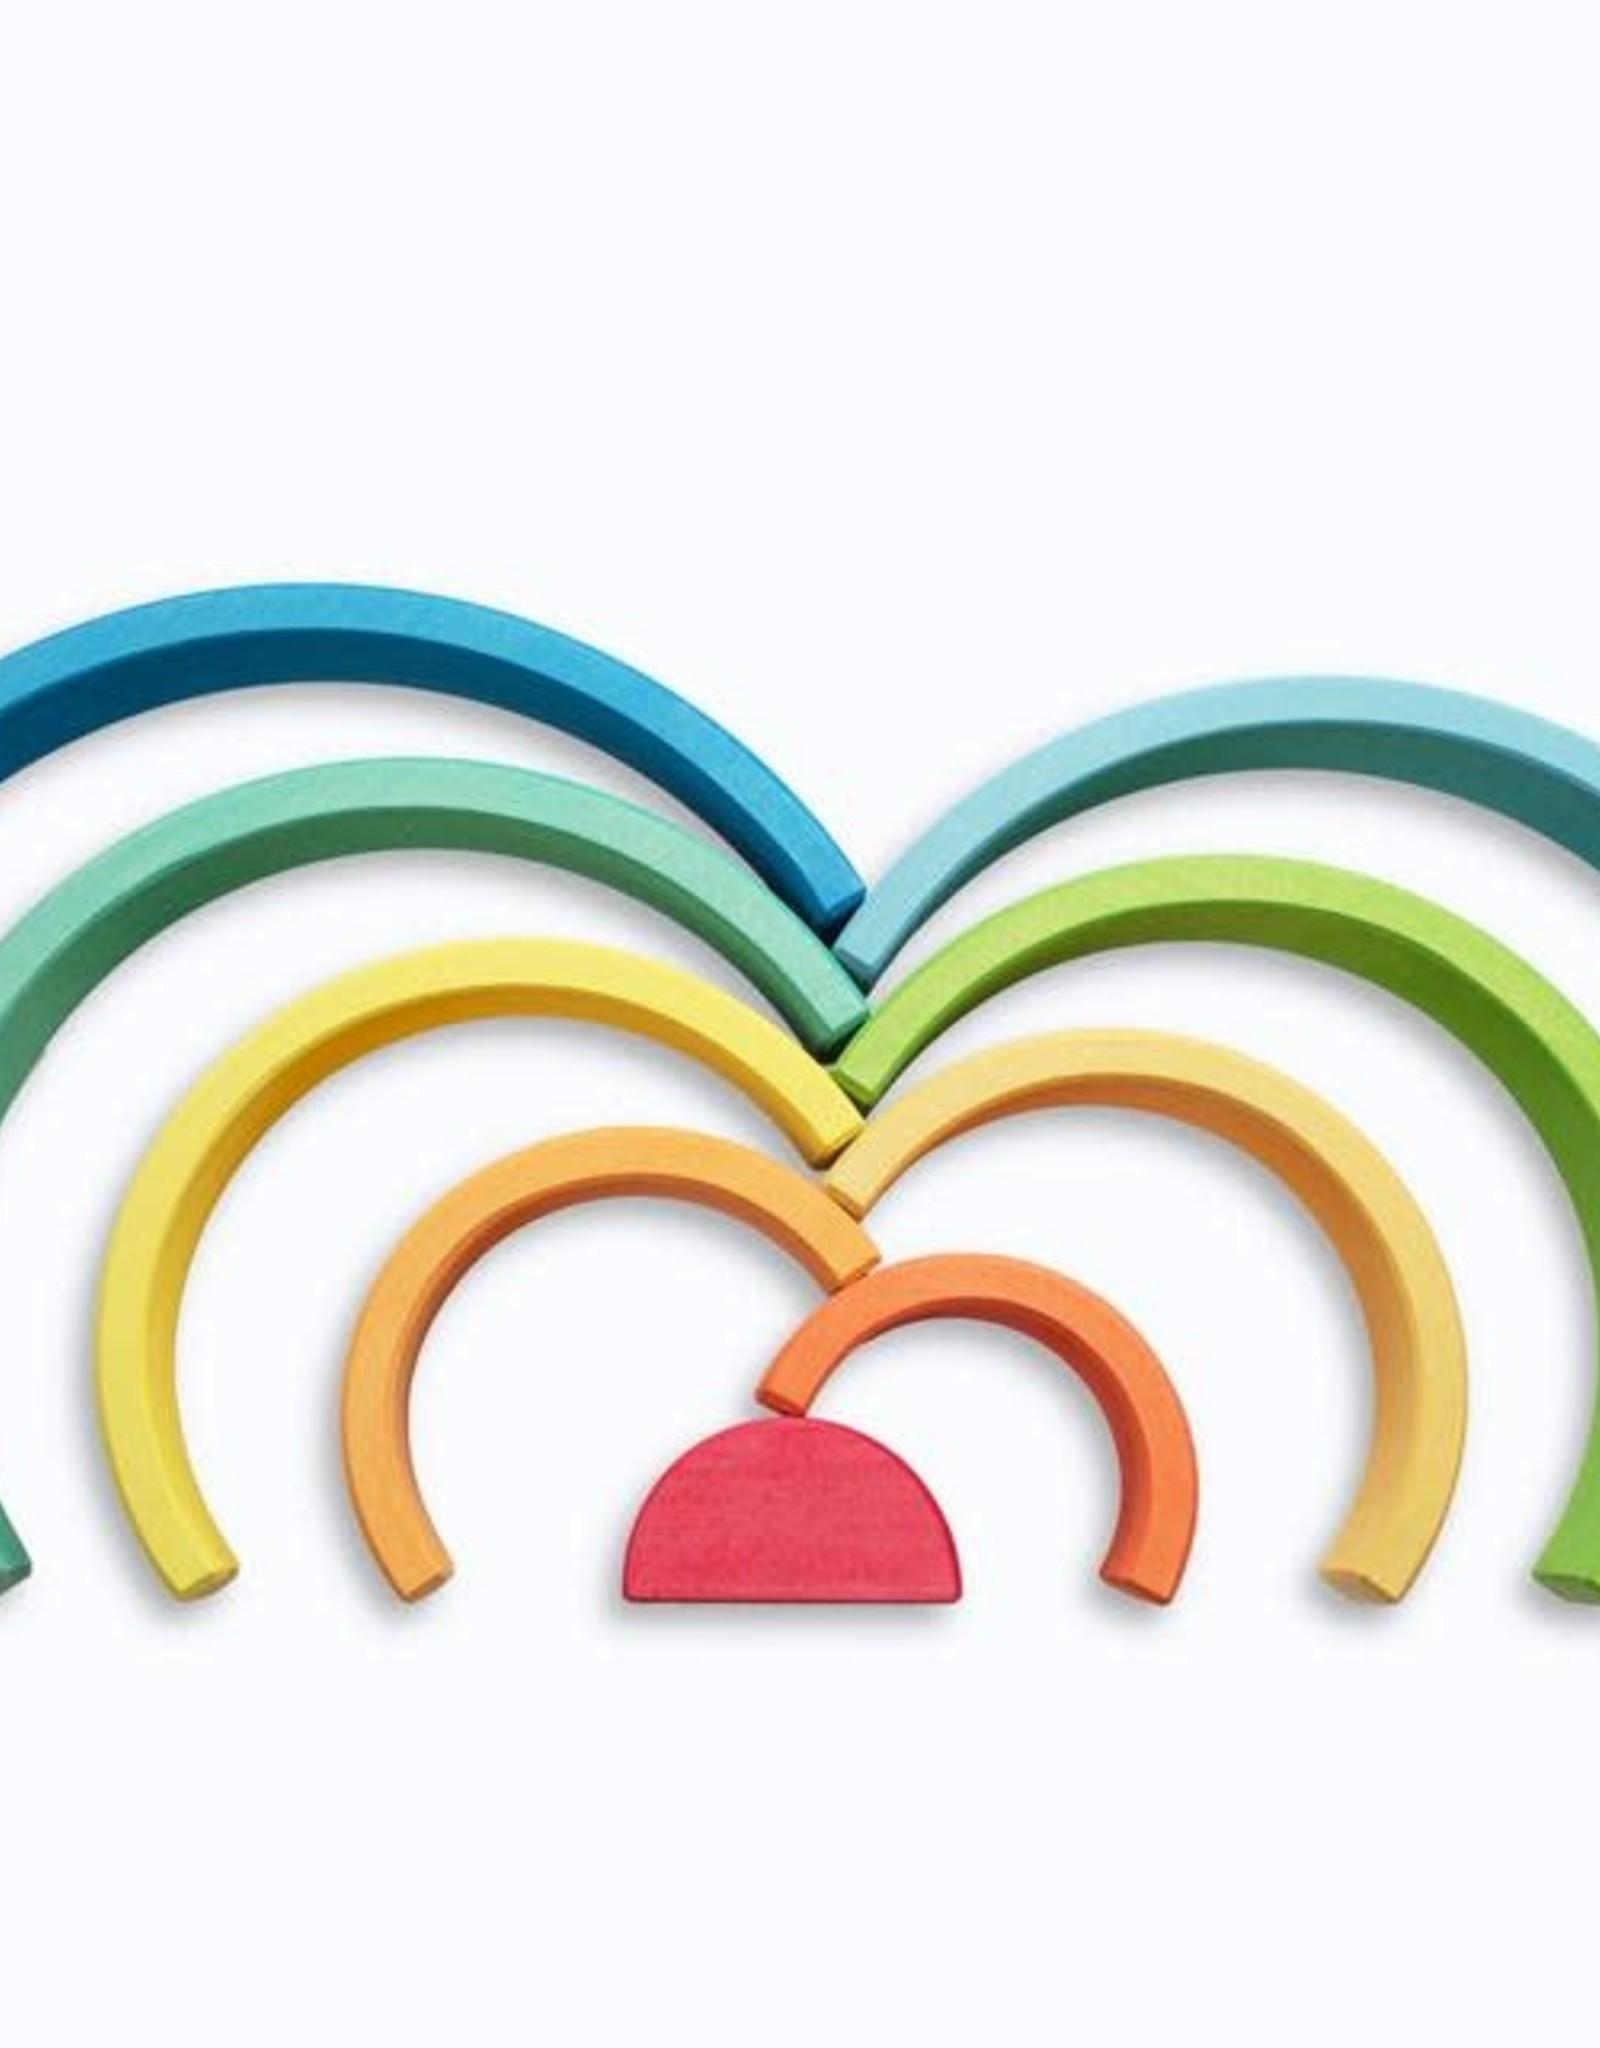 Ocamora 9 Piece Wooden Rainbow Stacker - Blue